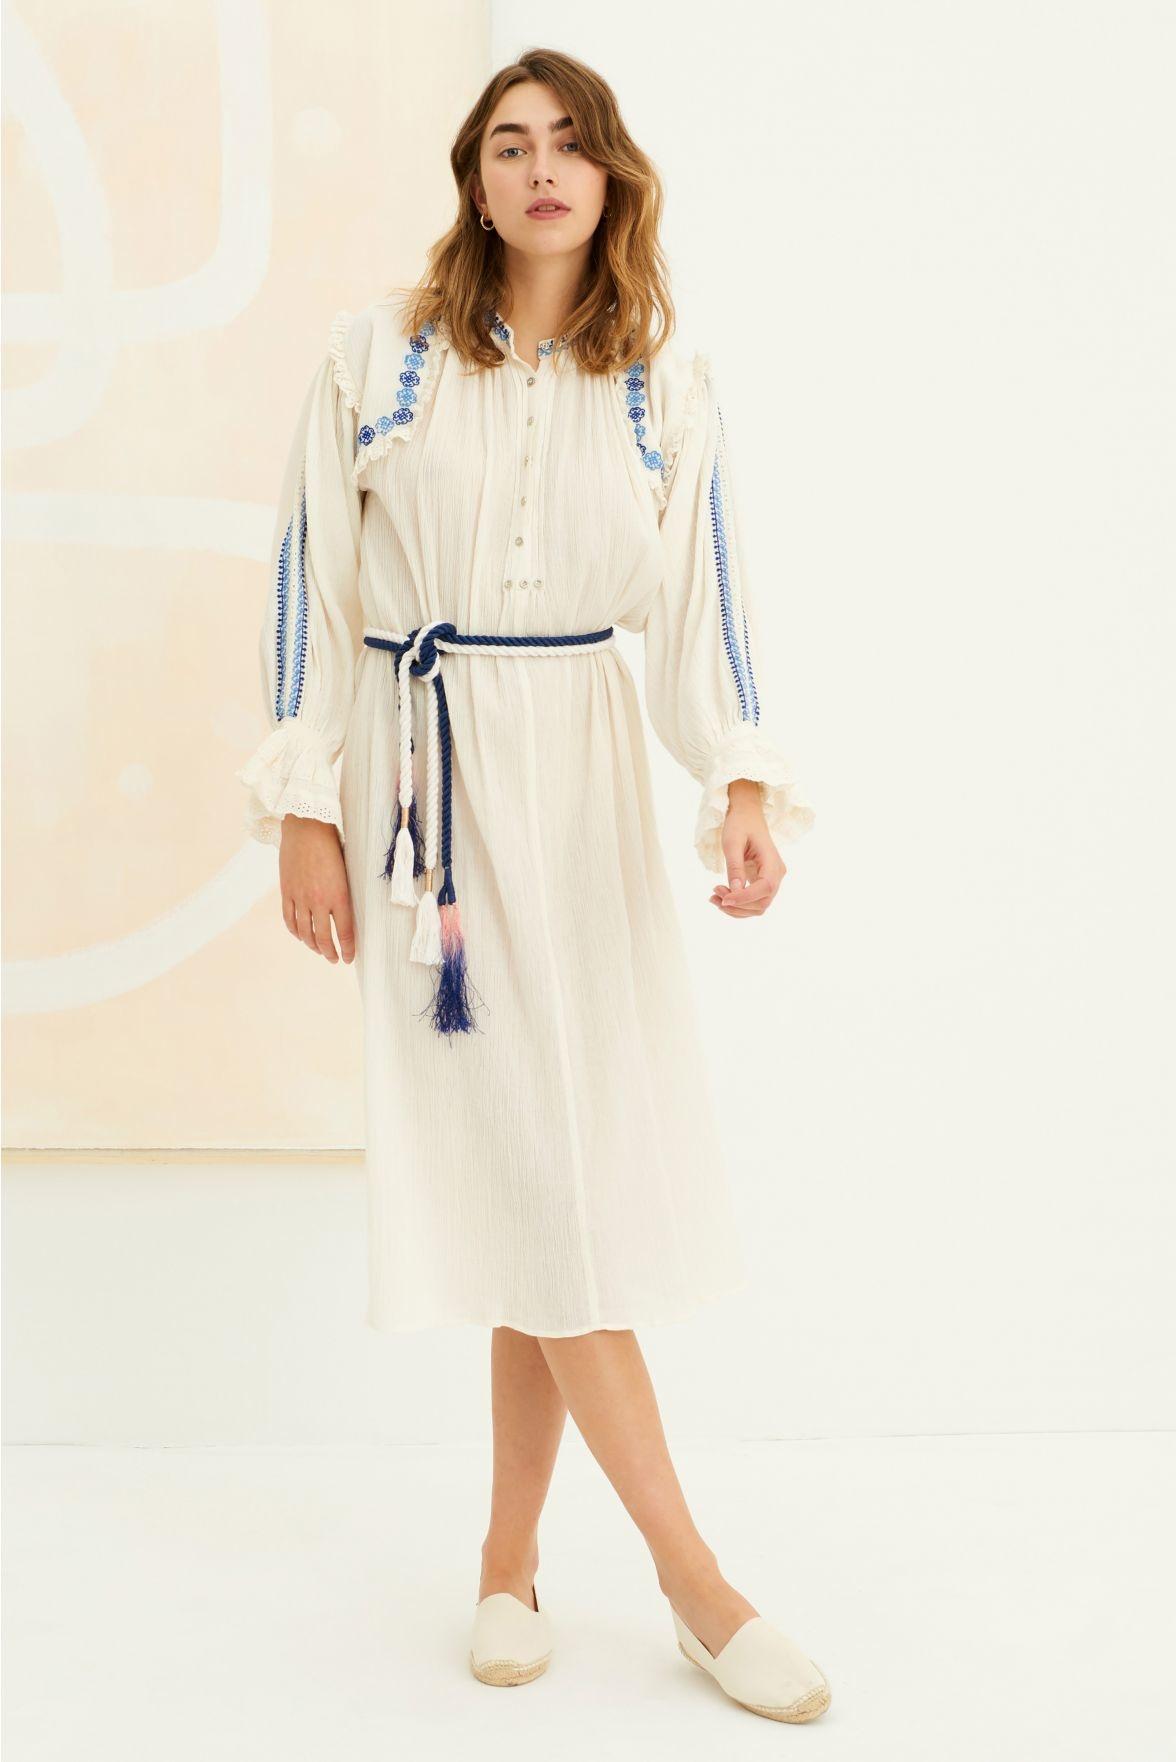 Pietro embroidered Dress white-2